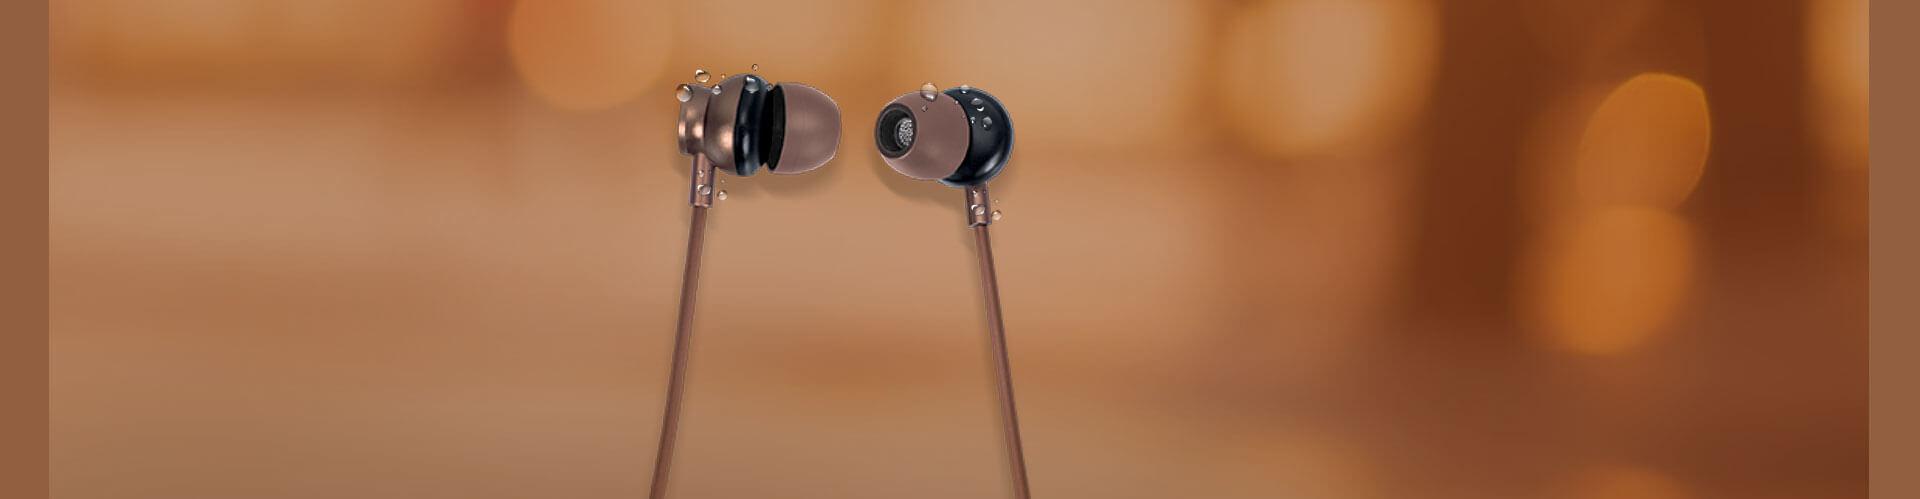 Fingers chic bt5 earphone features